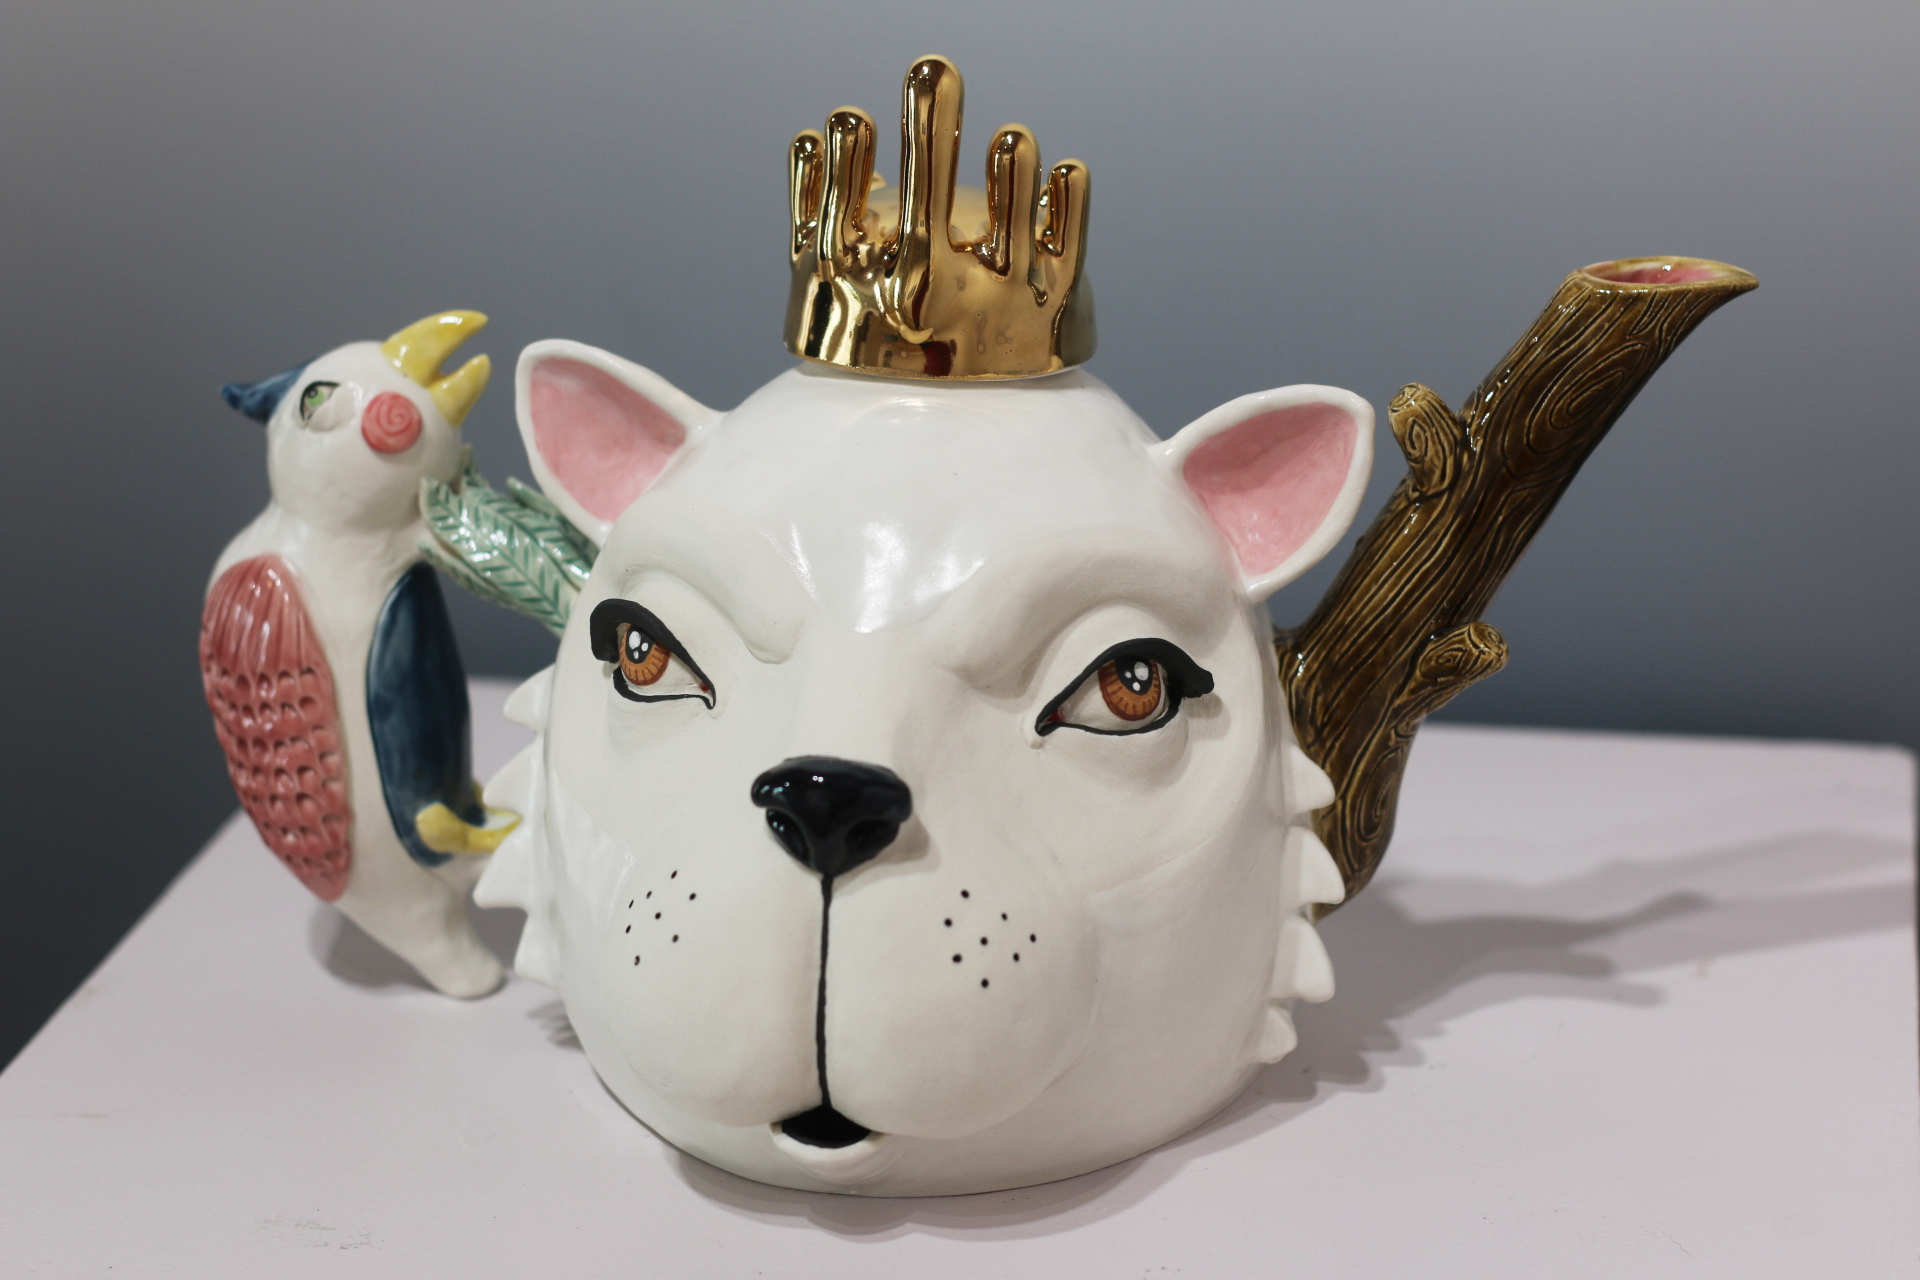 "Little Bird Told Me  9x9x13"", Porcelain teapot"